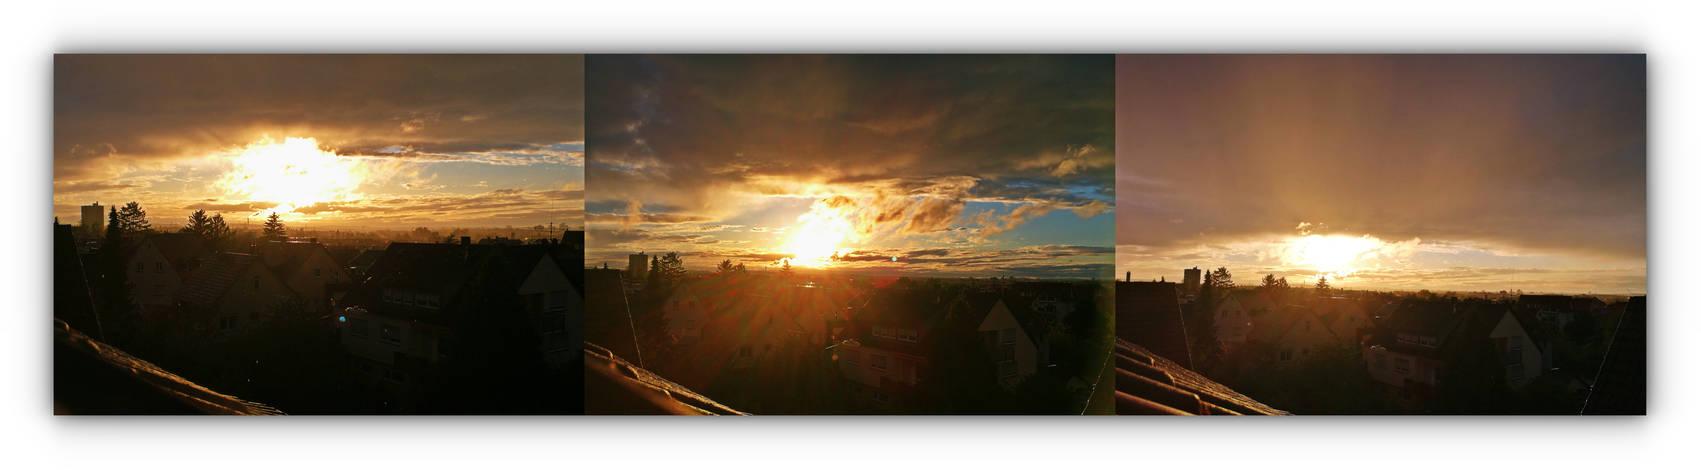 magical shimmering sunset